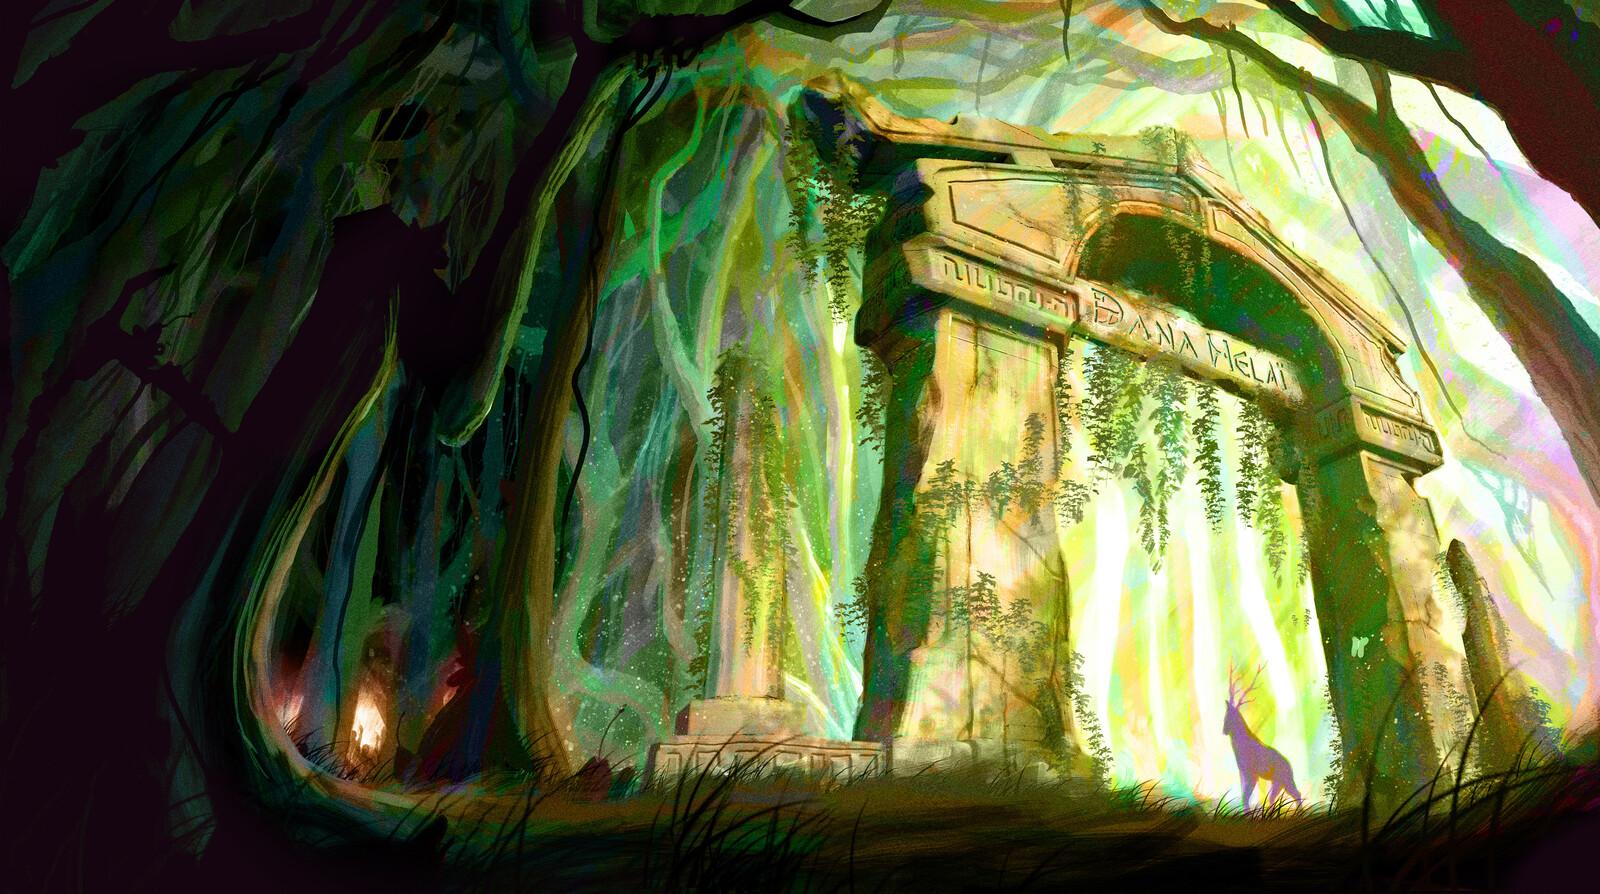 Enter the Gwacha